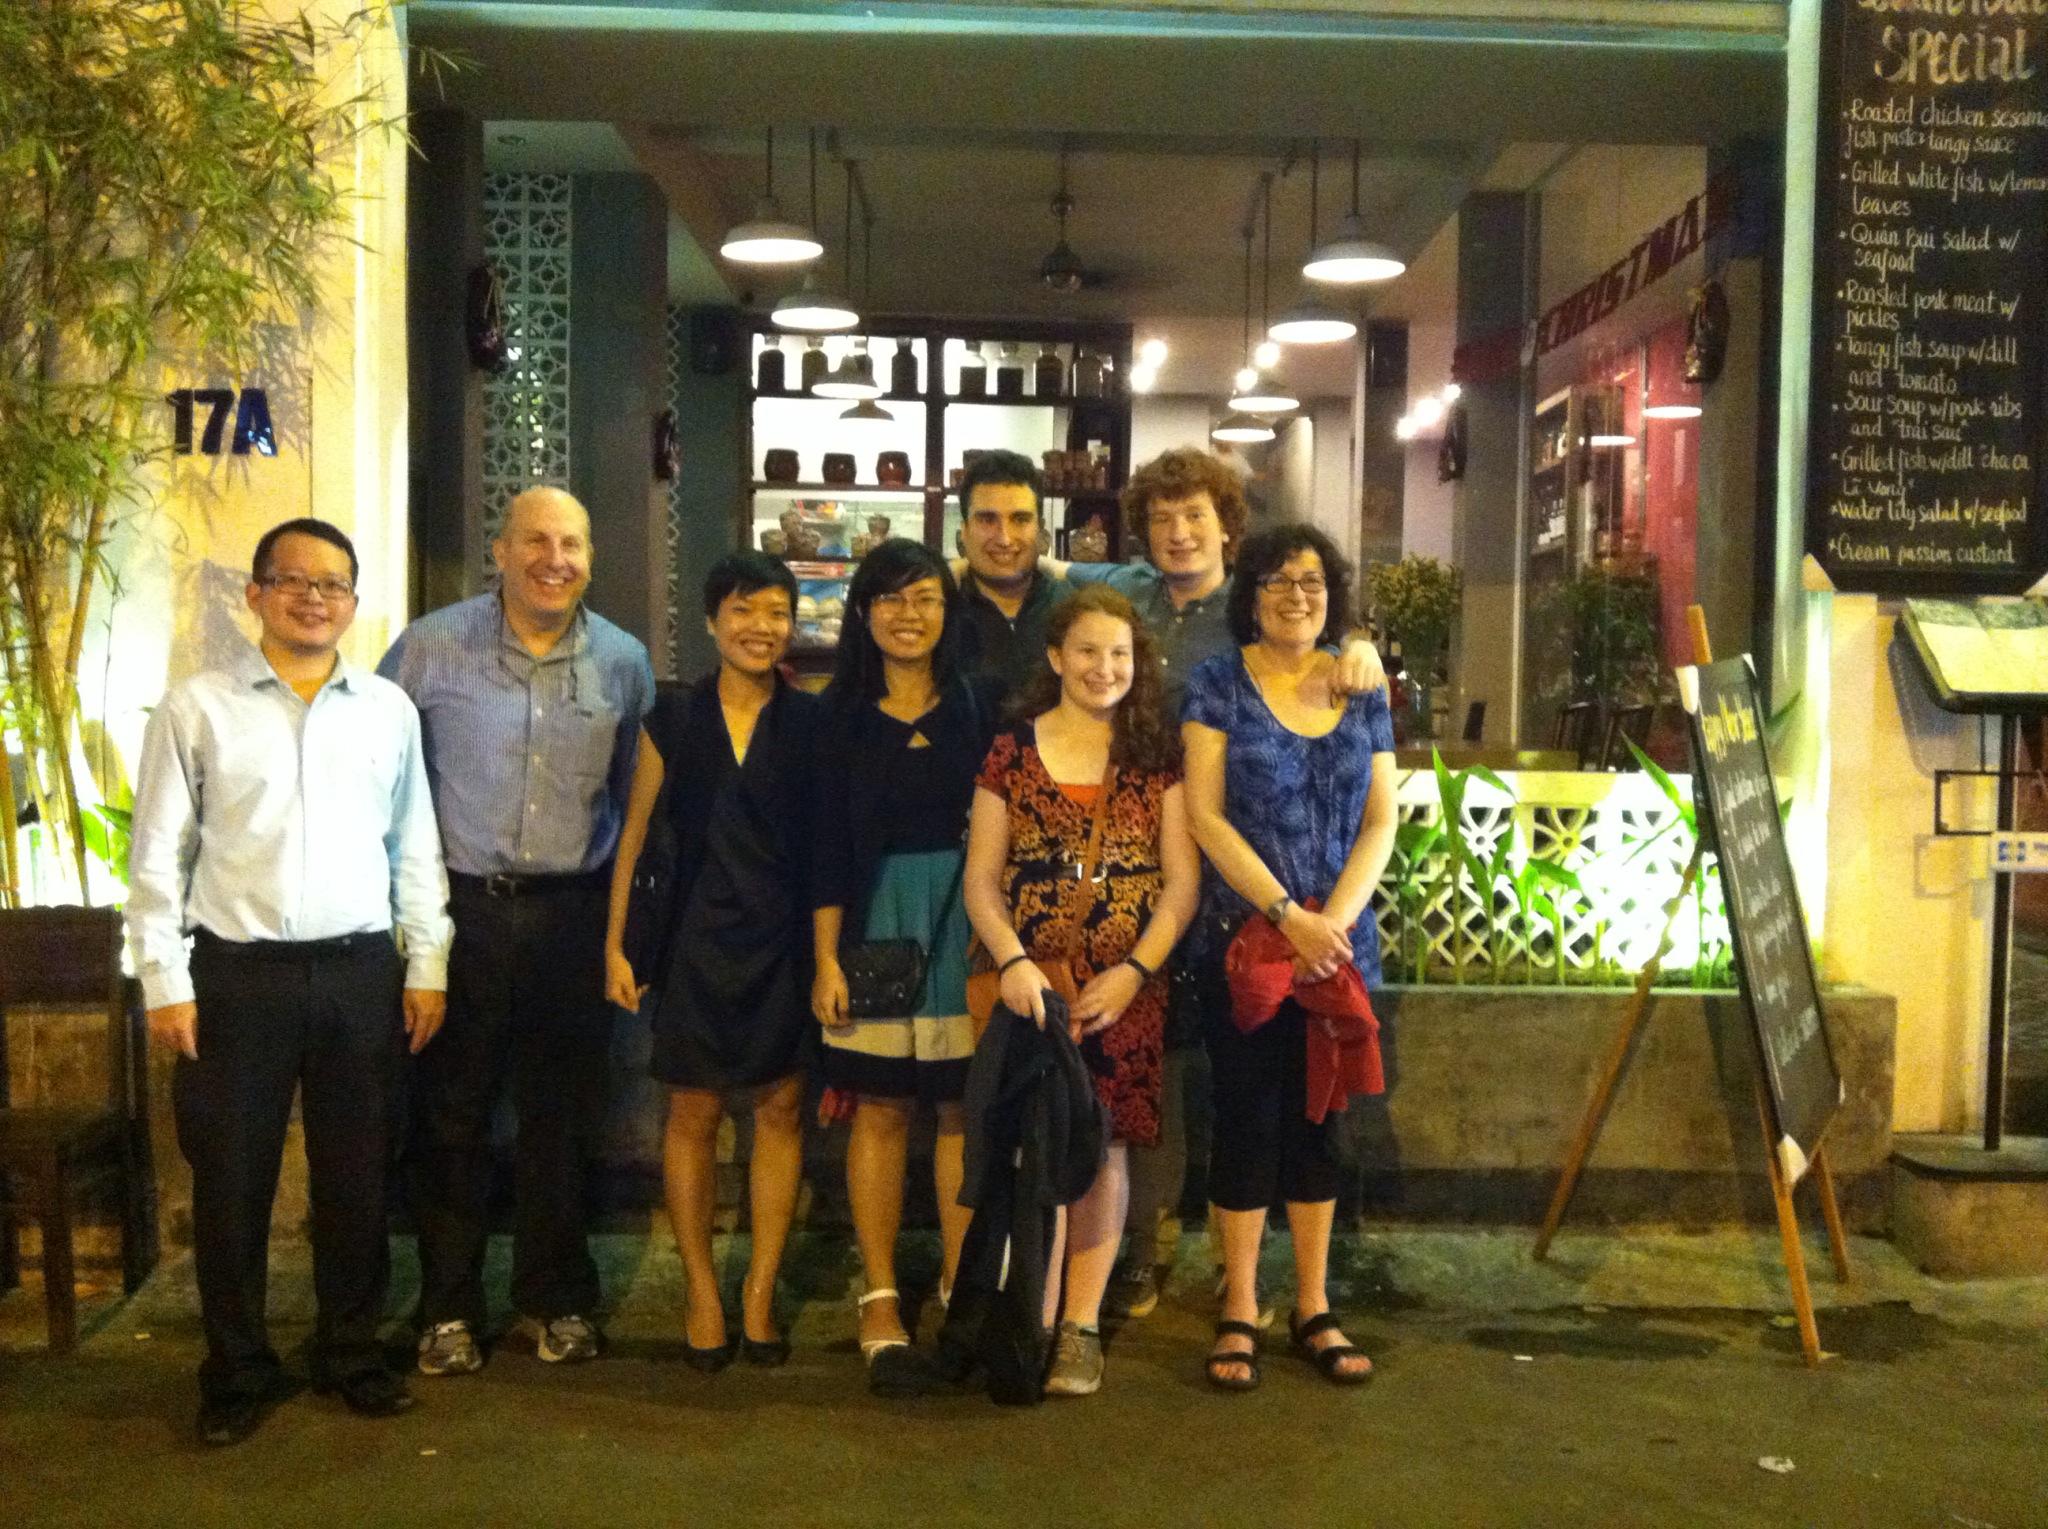 A group including President Krislov outside a restaurant